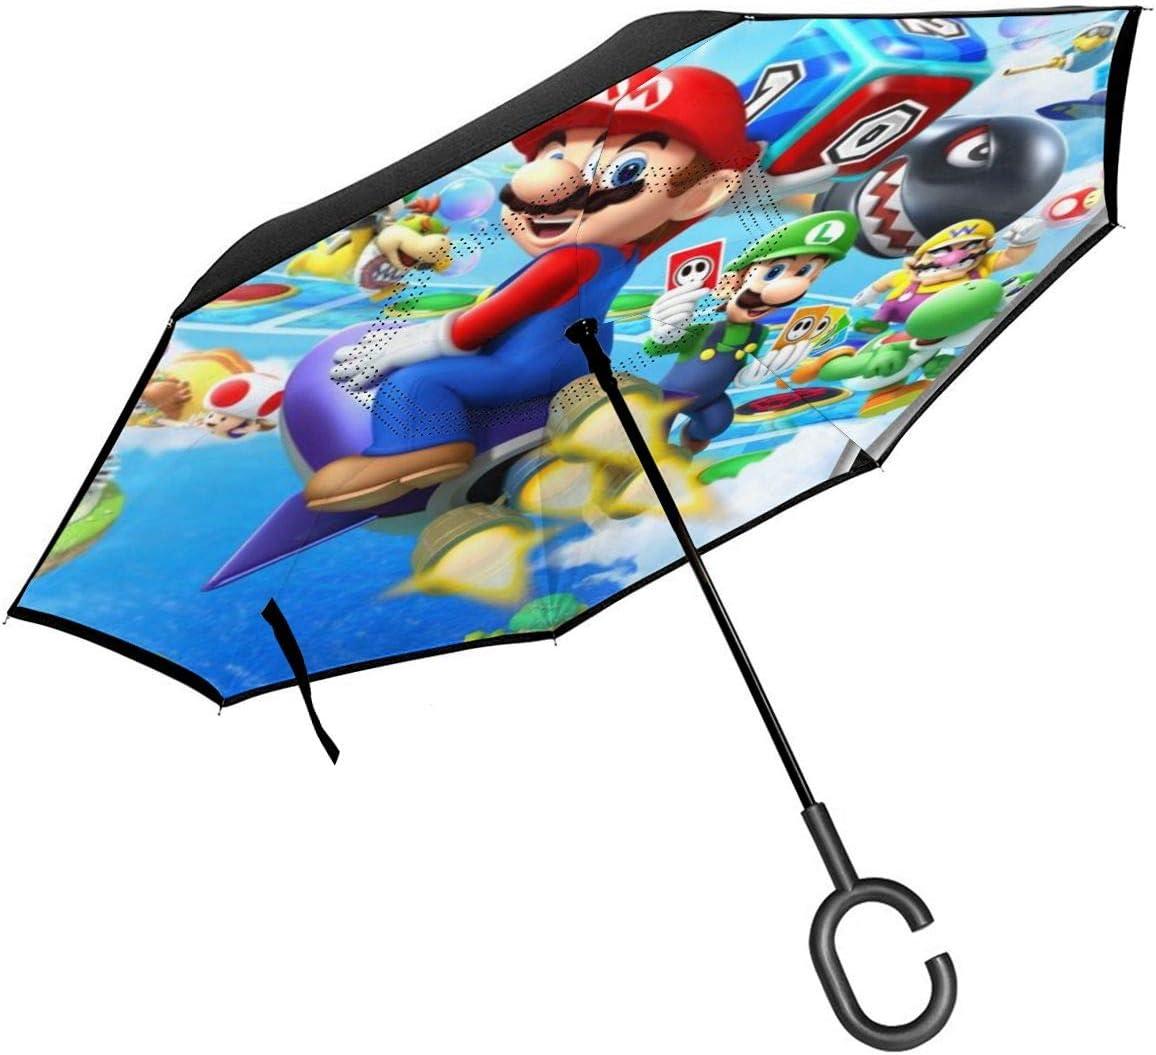 Windproof And Rainproof Double Folding Inverted Umbrella Game Super Mario Car Reverse Umbrella With C-Shaped Handle UV Protection Inverted Folding Umbrellas